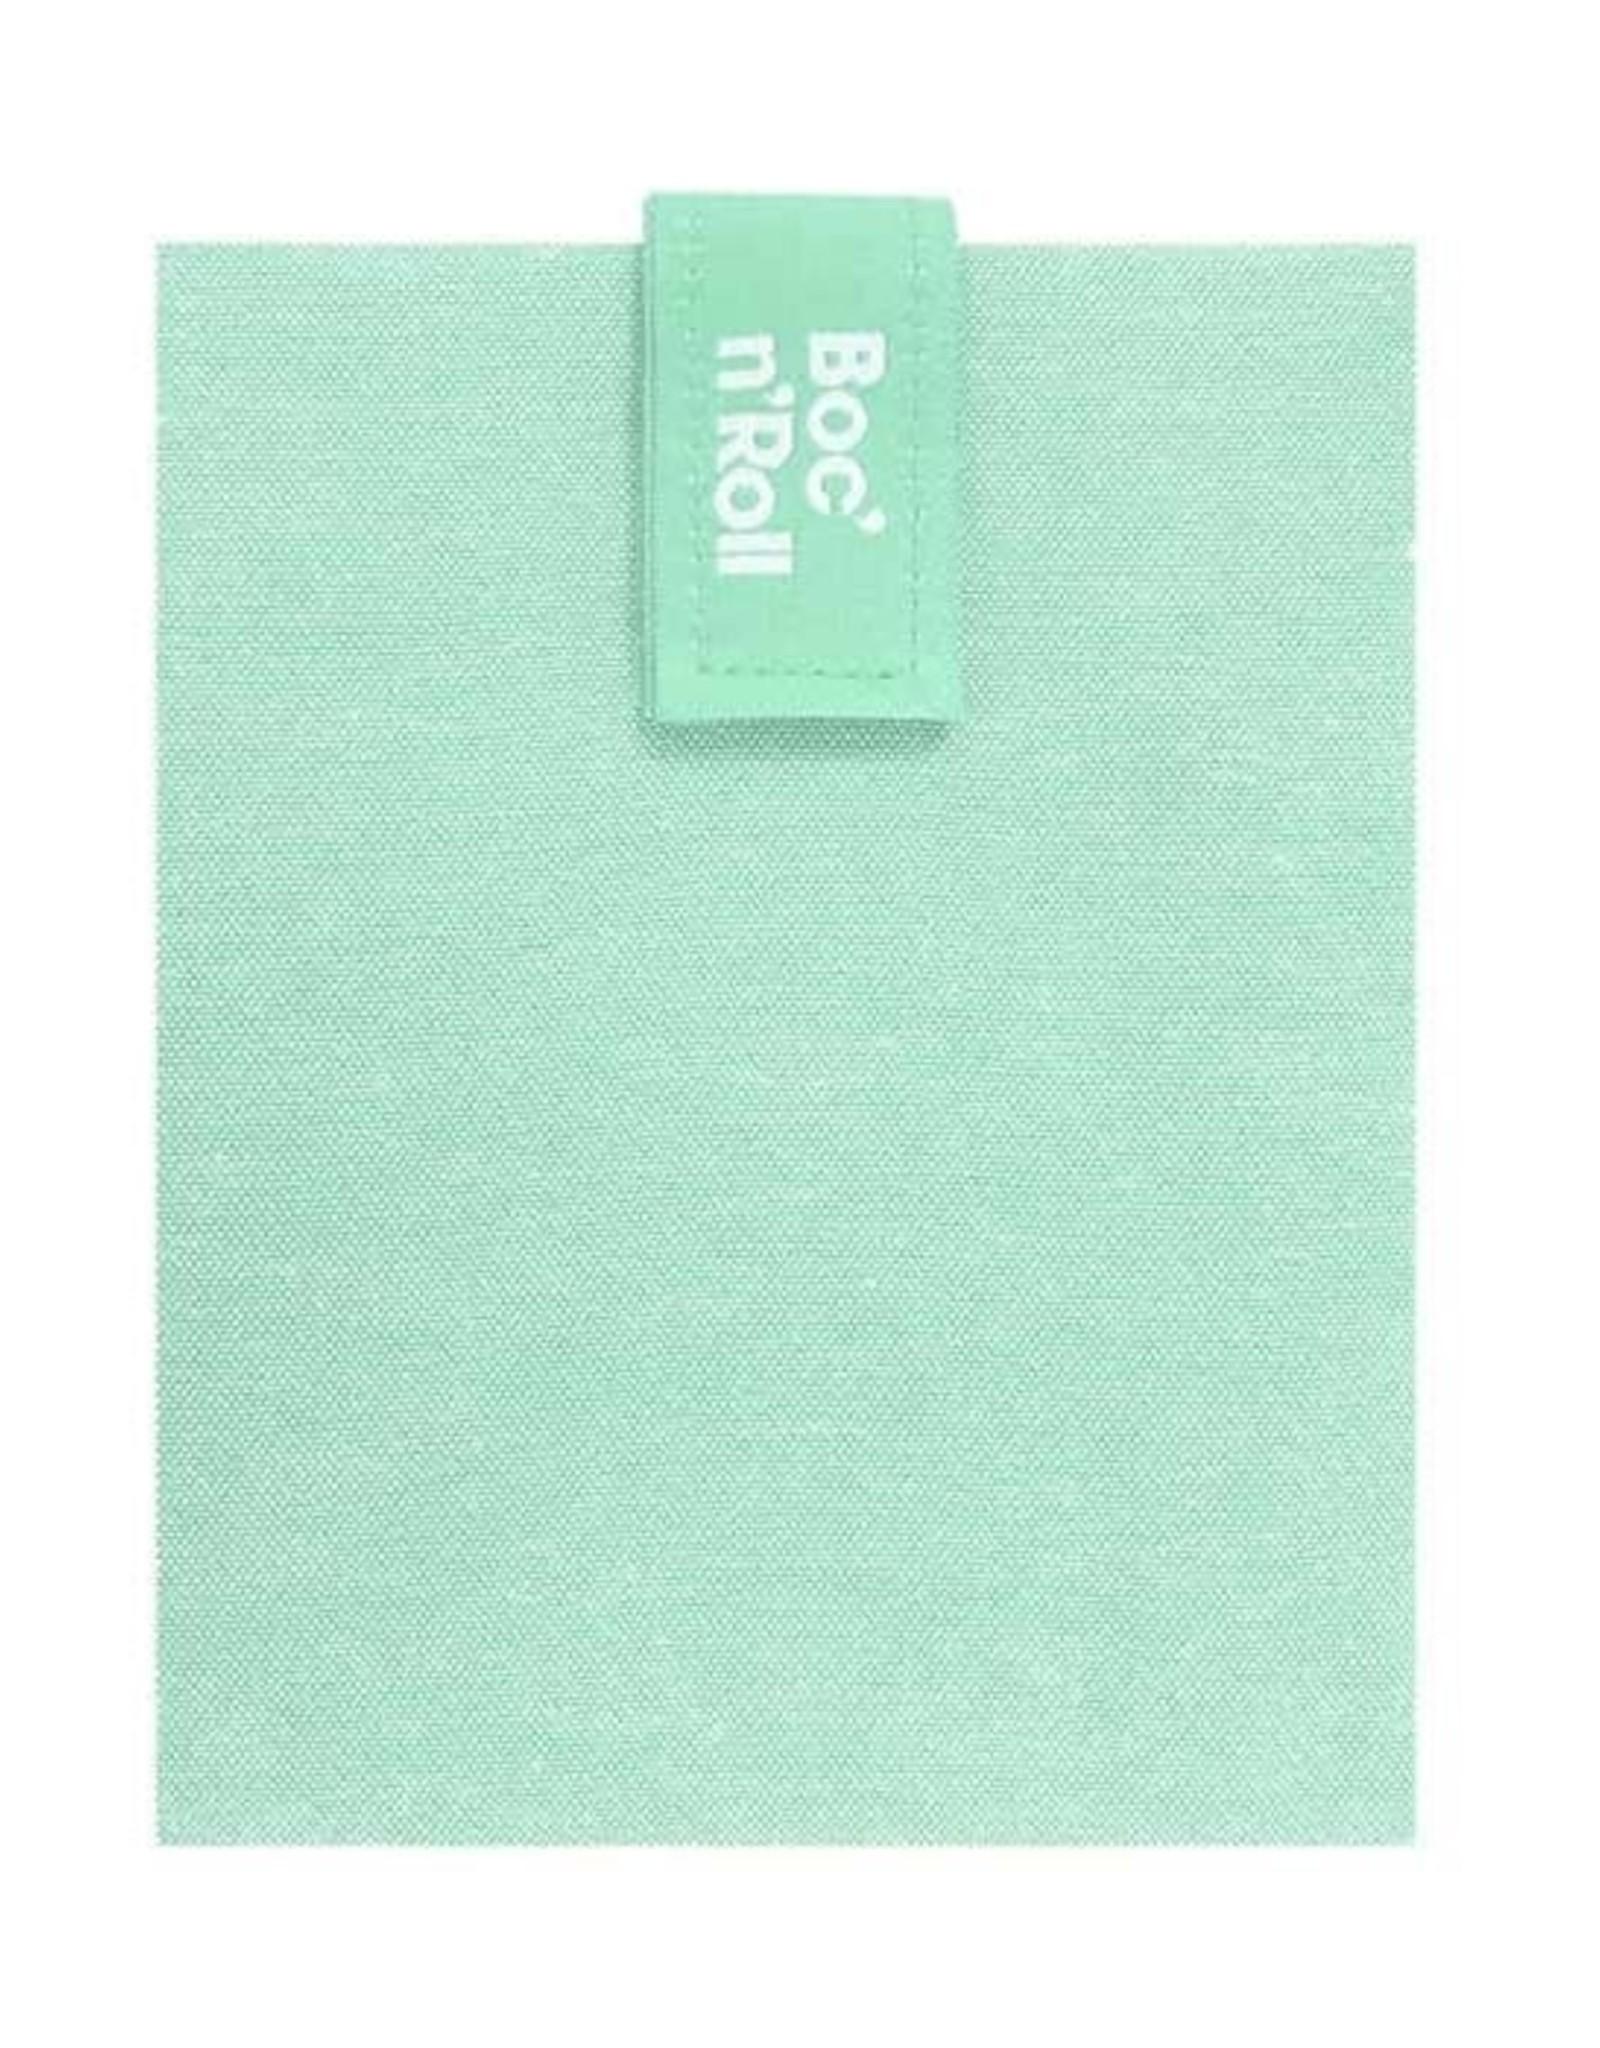 Roll'Eat Boc'n'Roll - Eco green